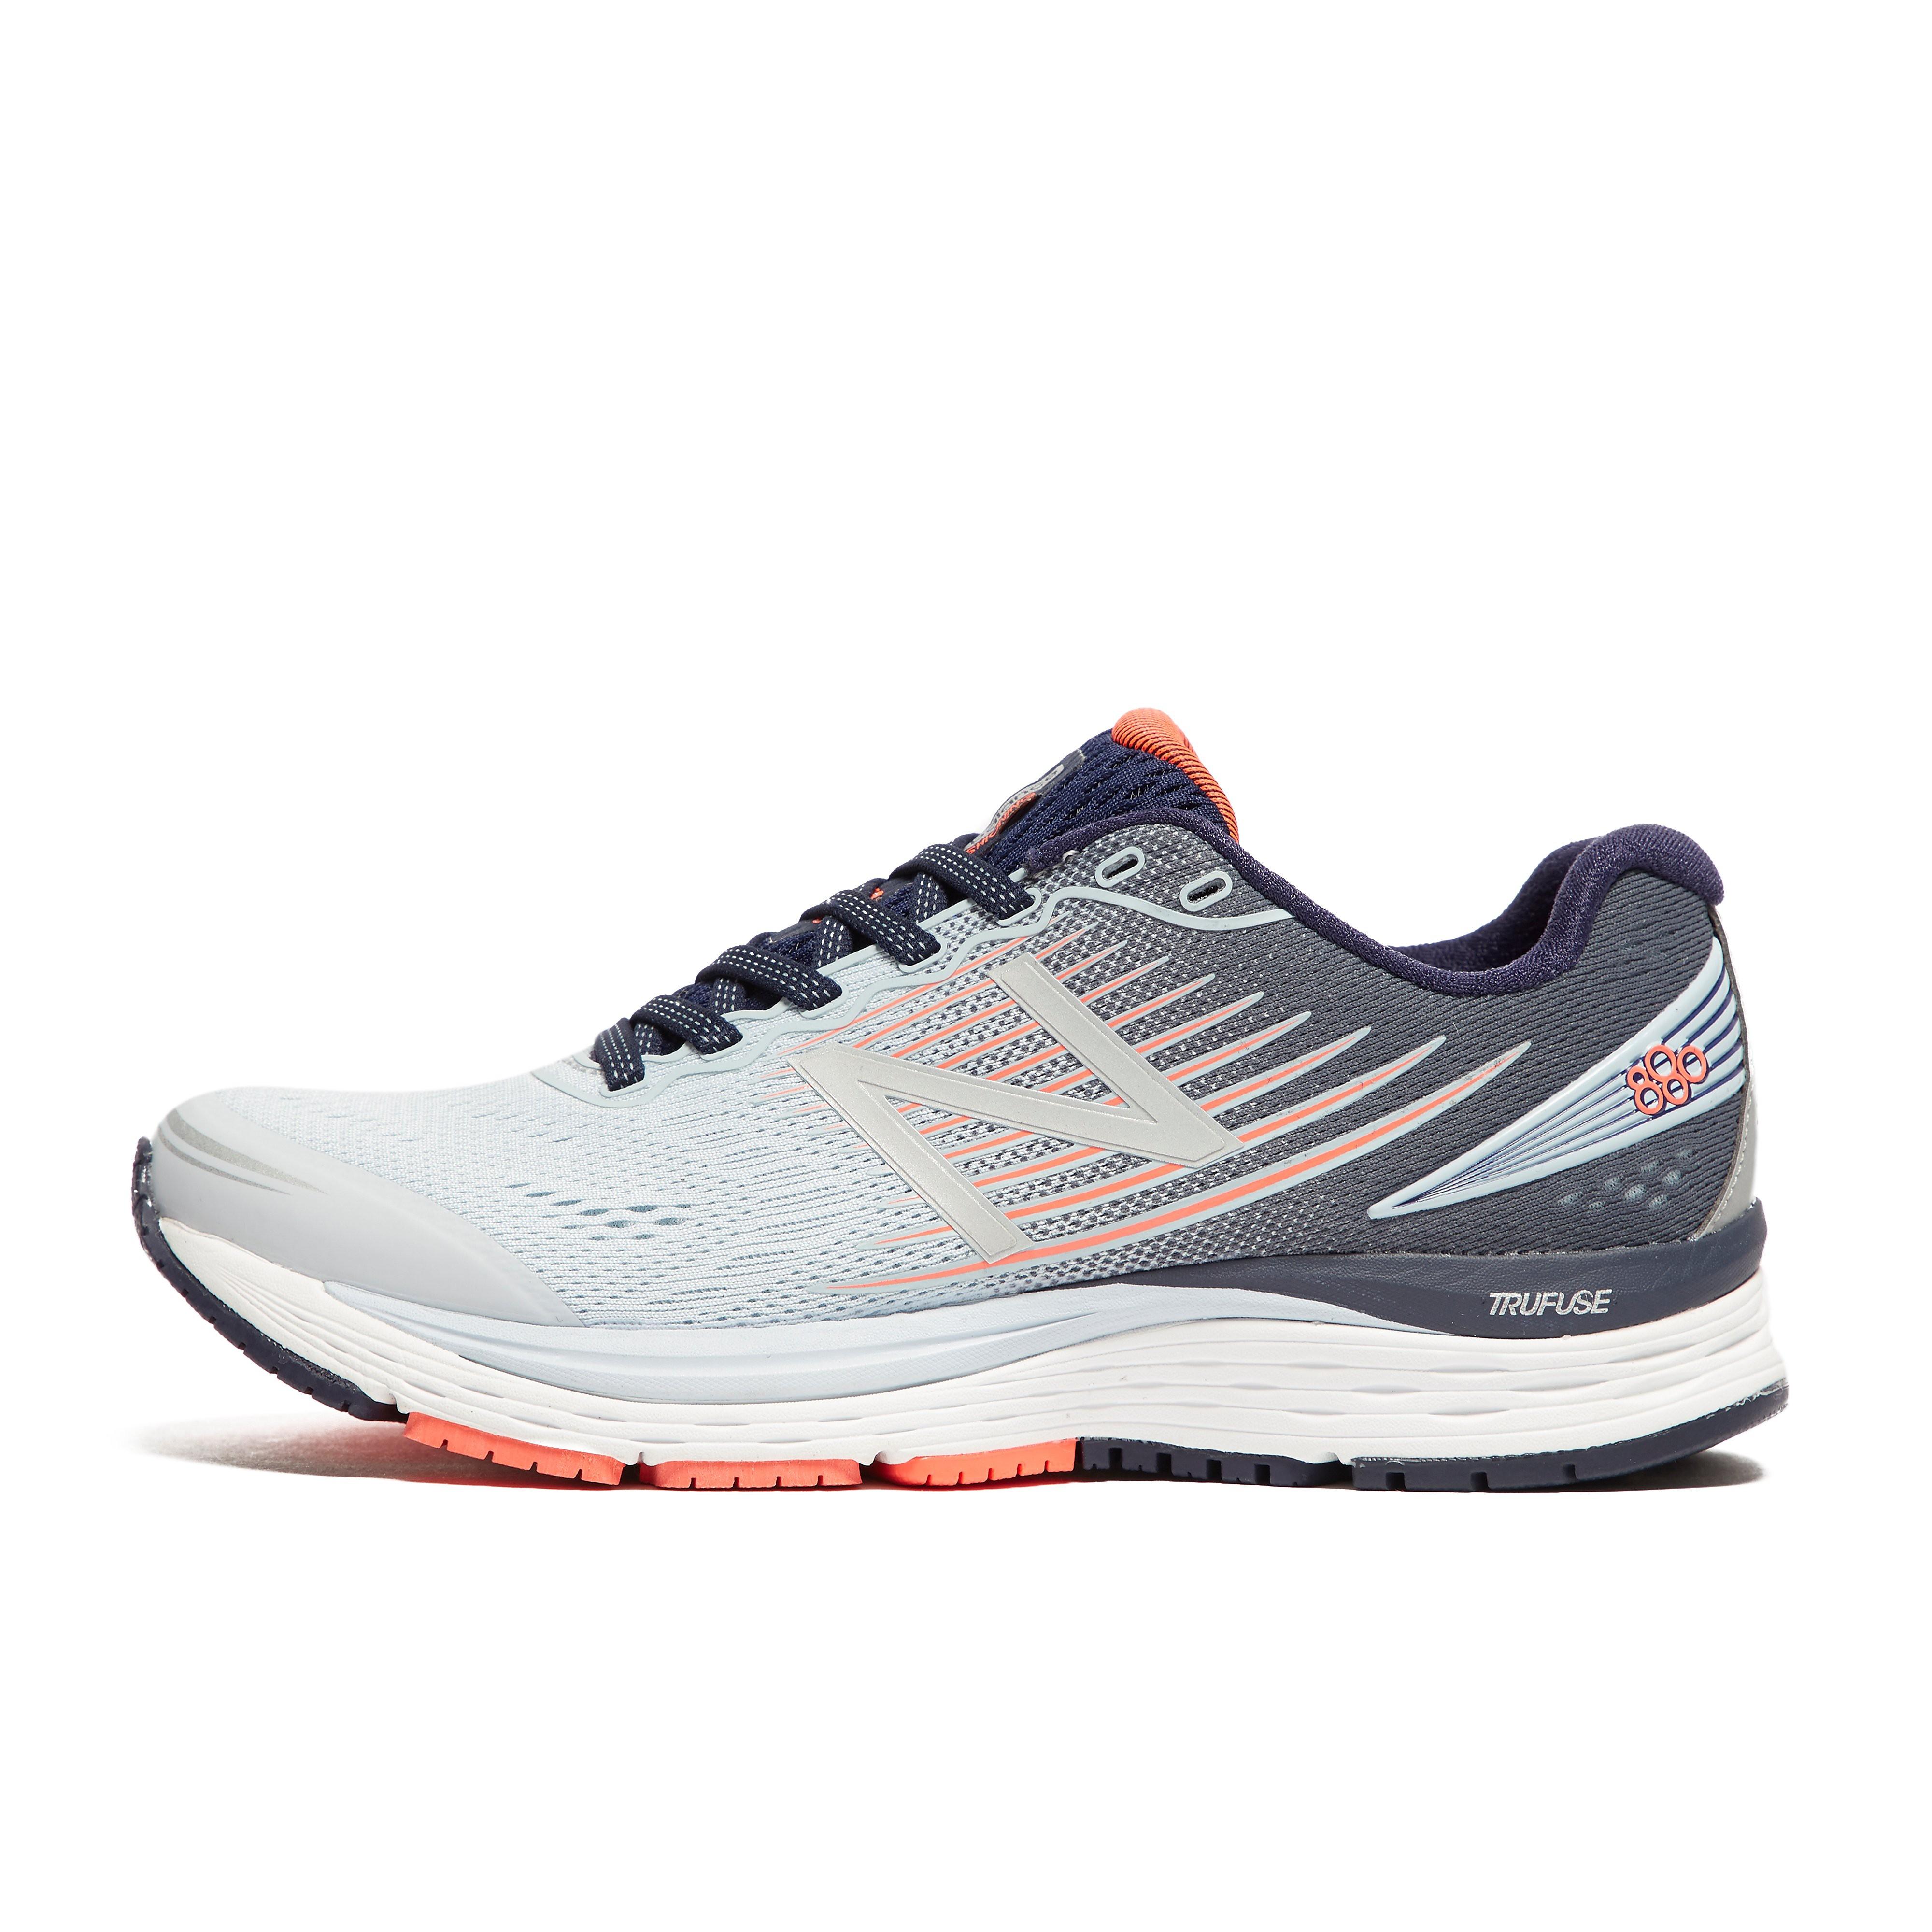 Womens Blue New Balance 880v7 Running Shoes